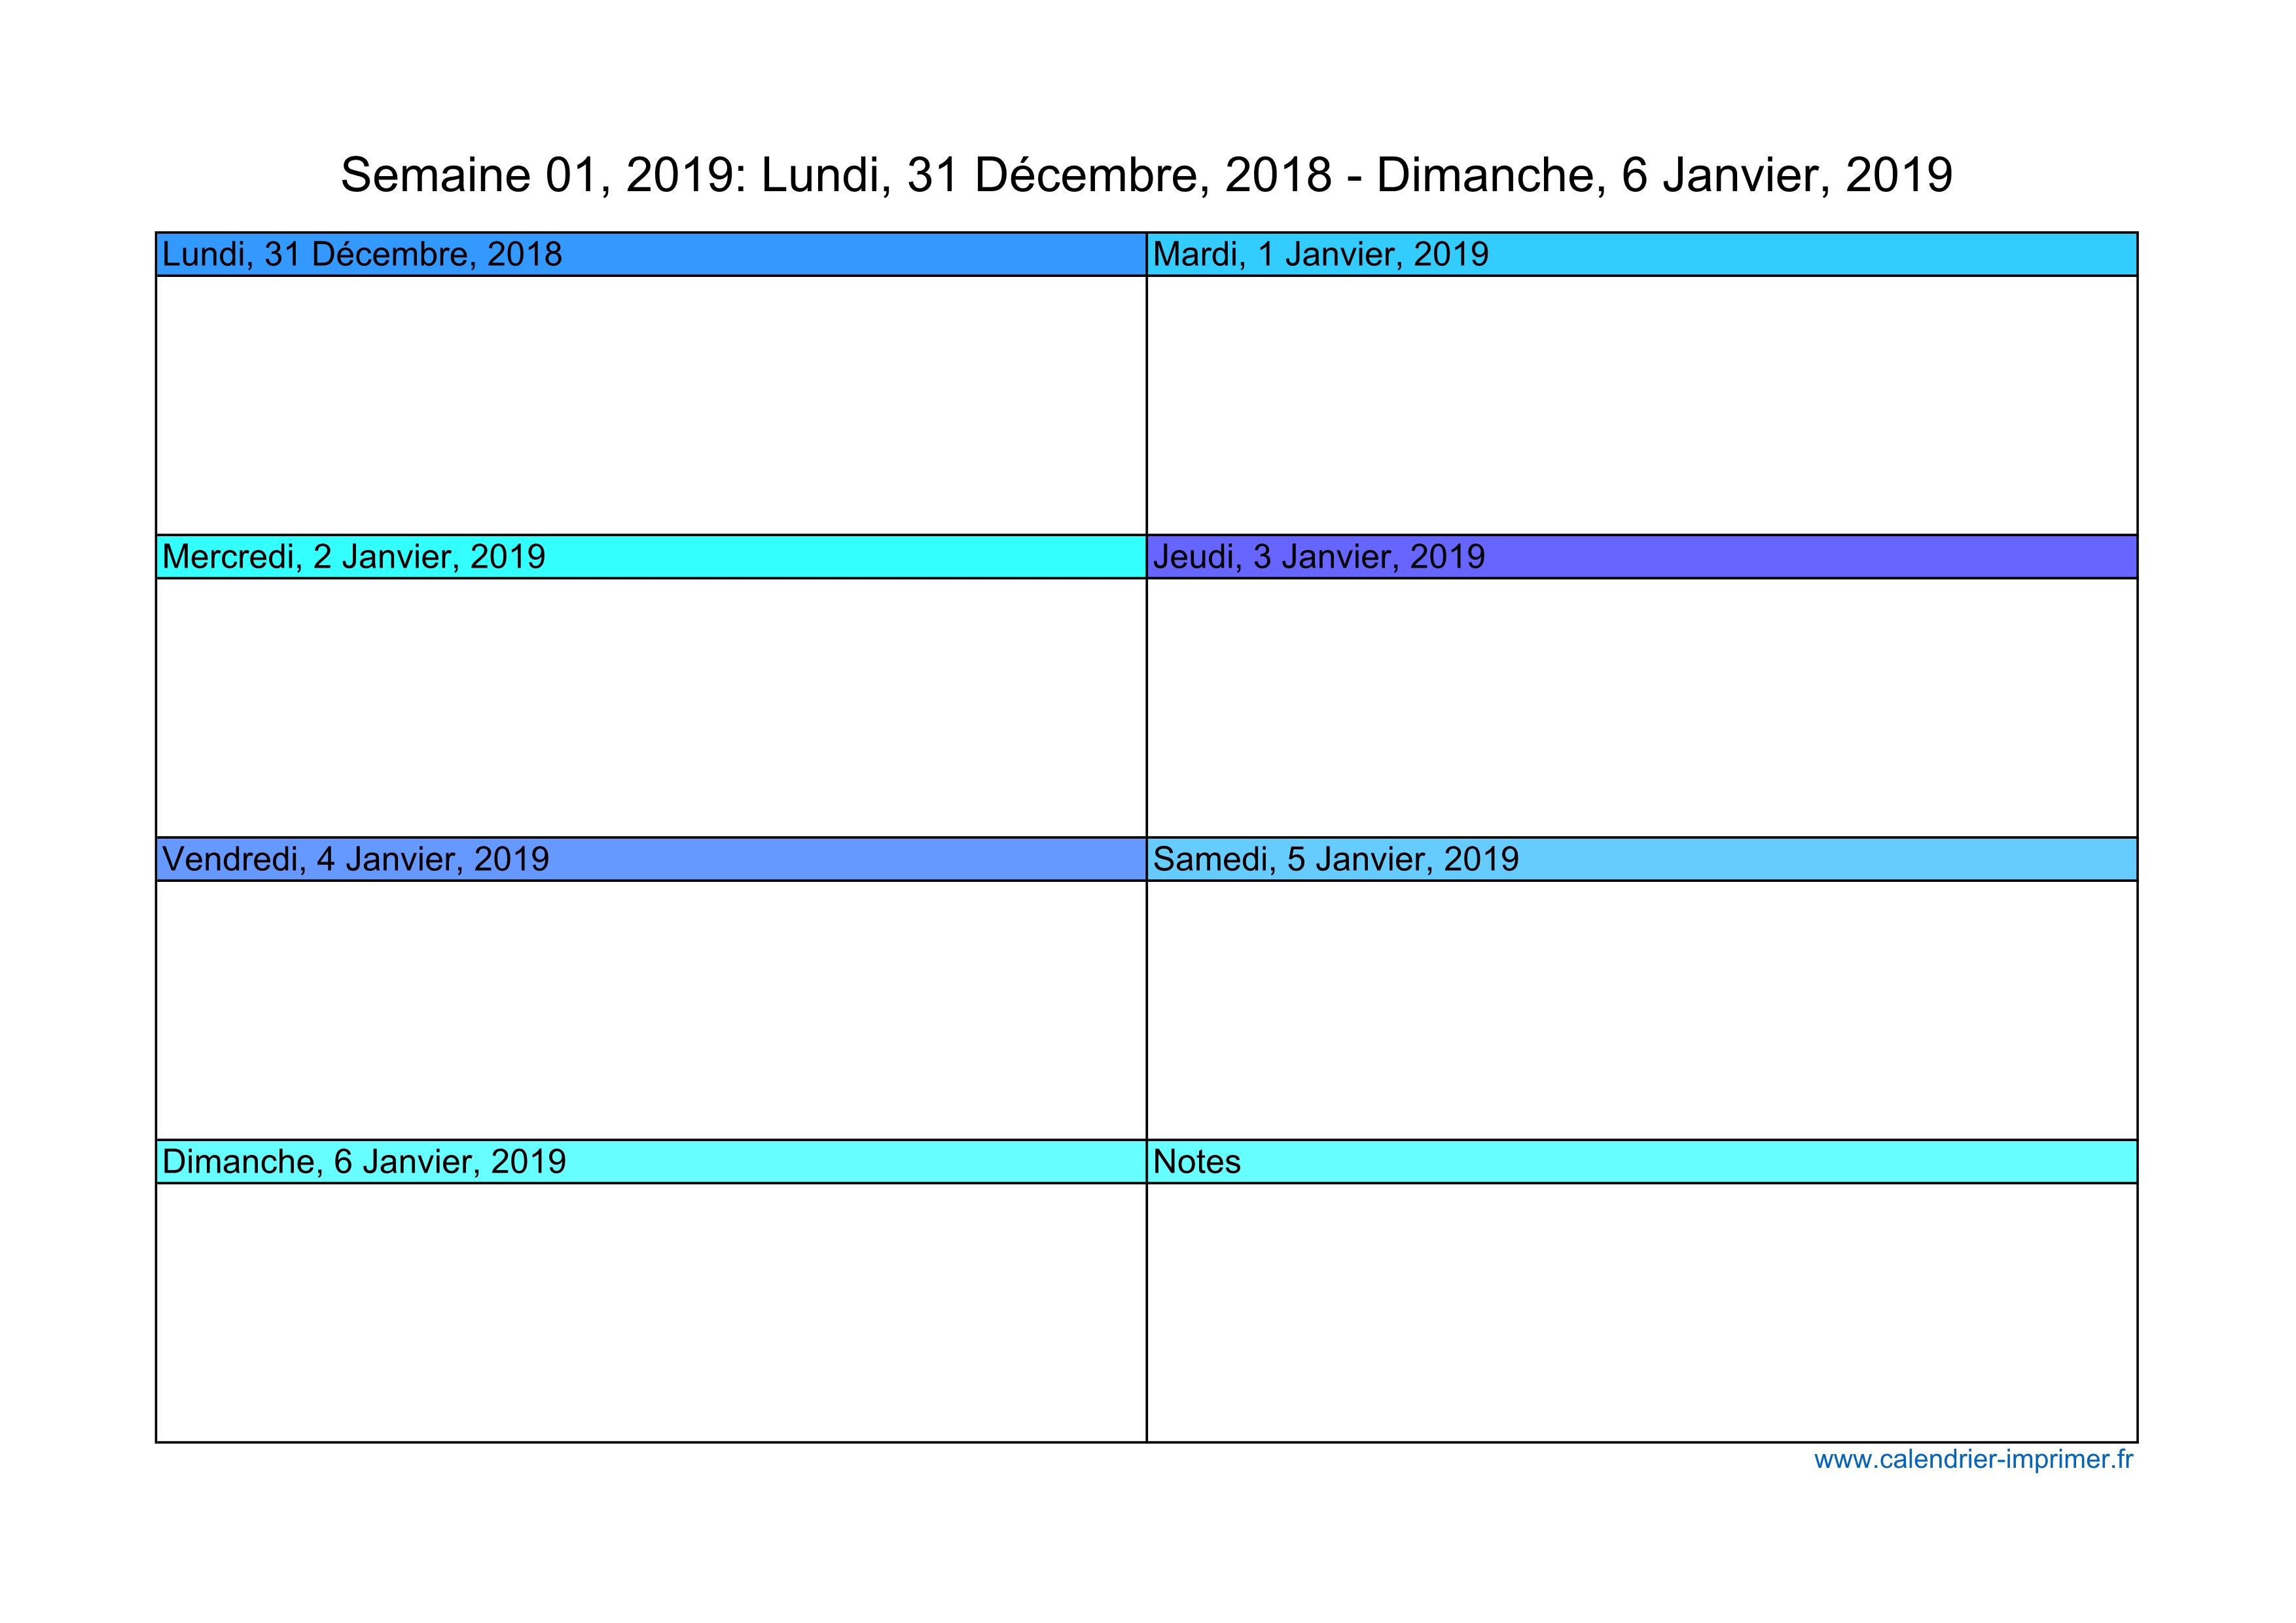 Calendrier Semaine Excel.Calendrier 2019 Semaine Planning Hebdomadaire Semainier